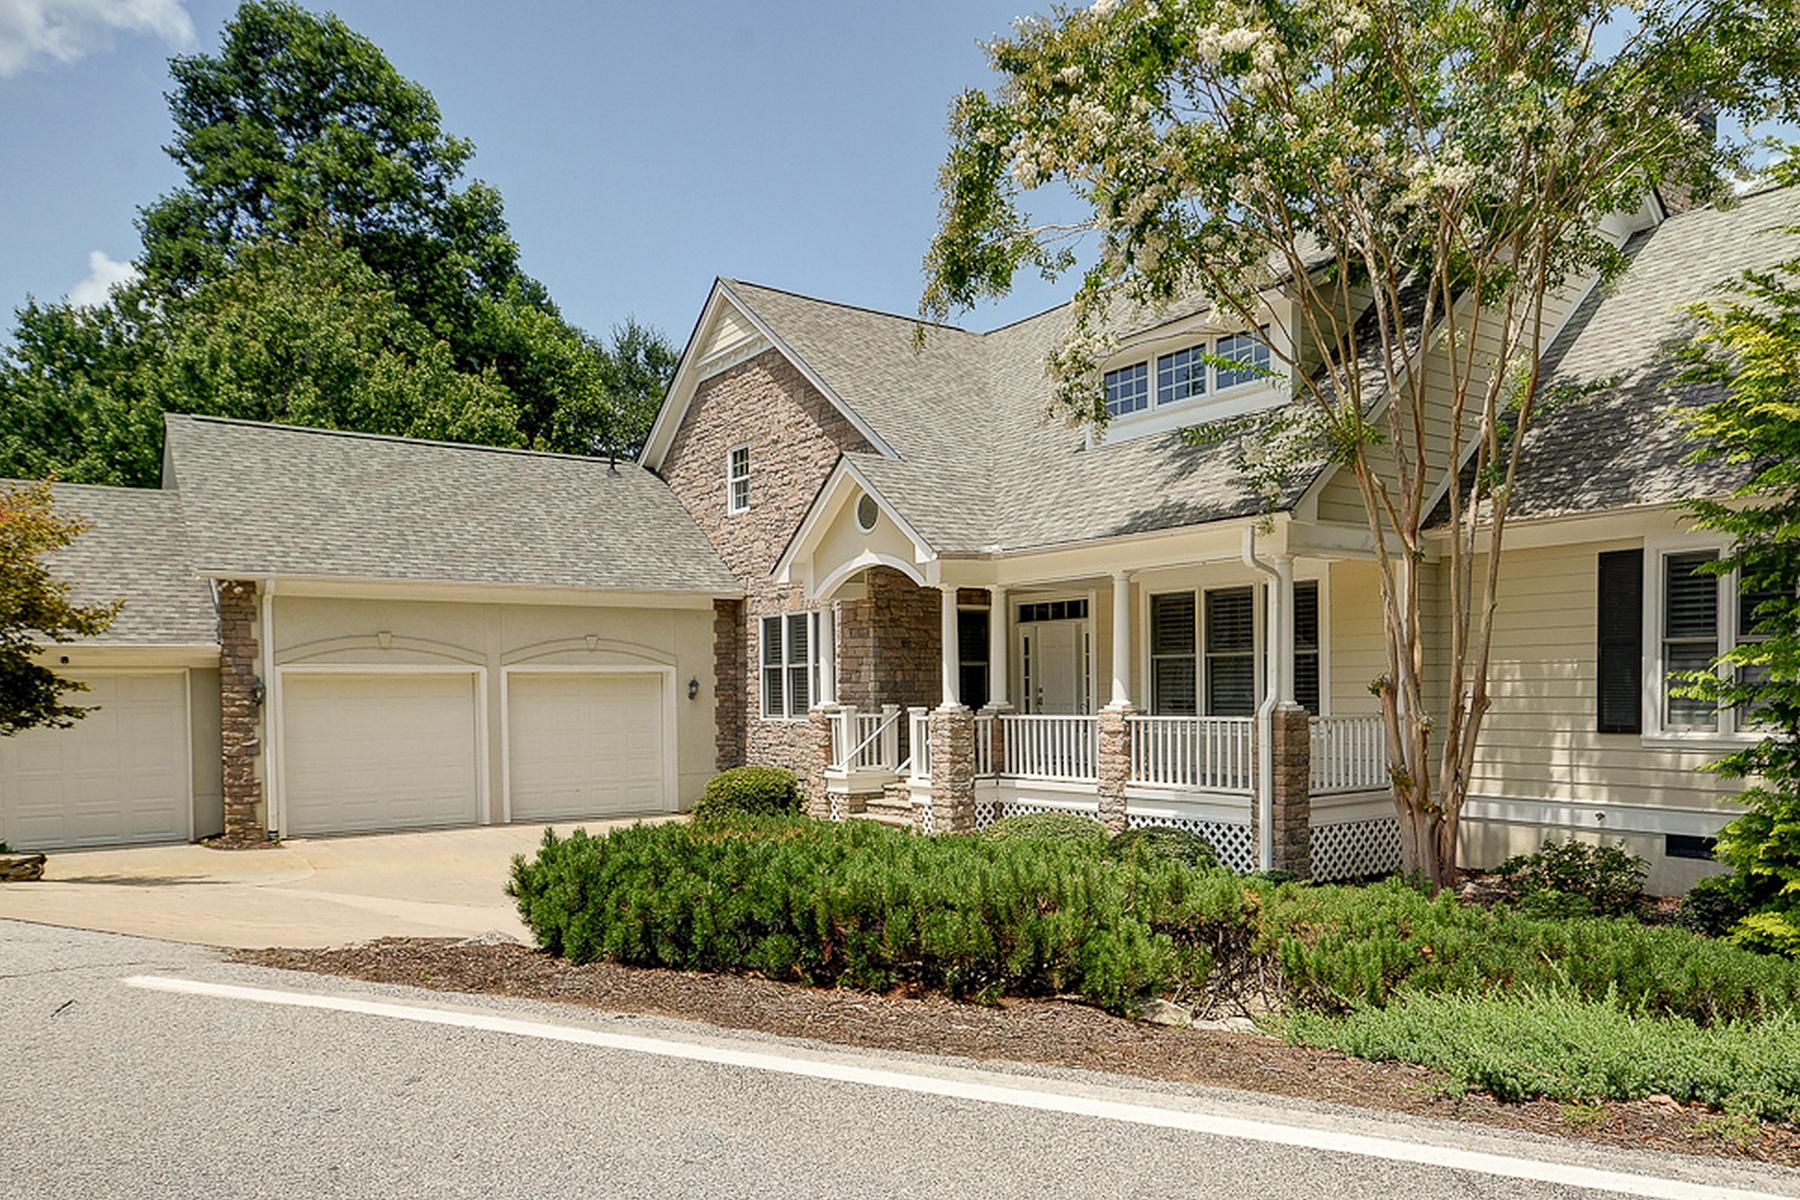 獨棟家庭住宅 為 出售 在 THE CLIFFS AT GLASSY 3 Soft Breeze Ct Landrum, 南卡羅來納州, 29356 美國